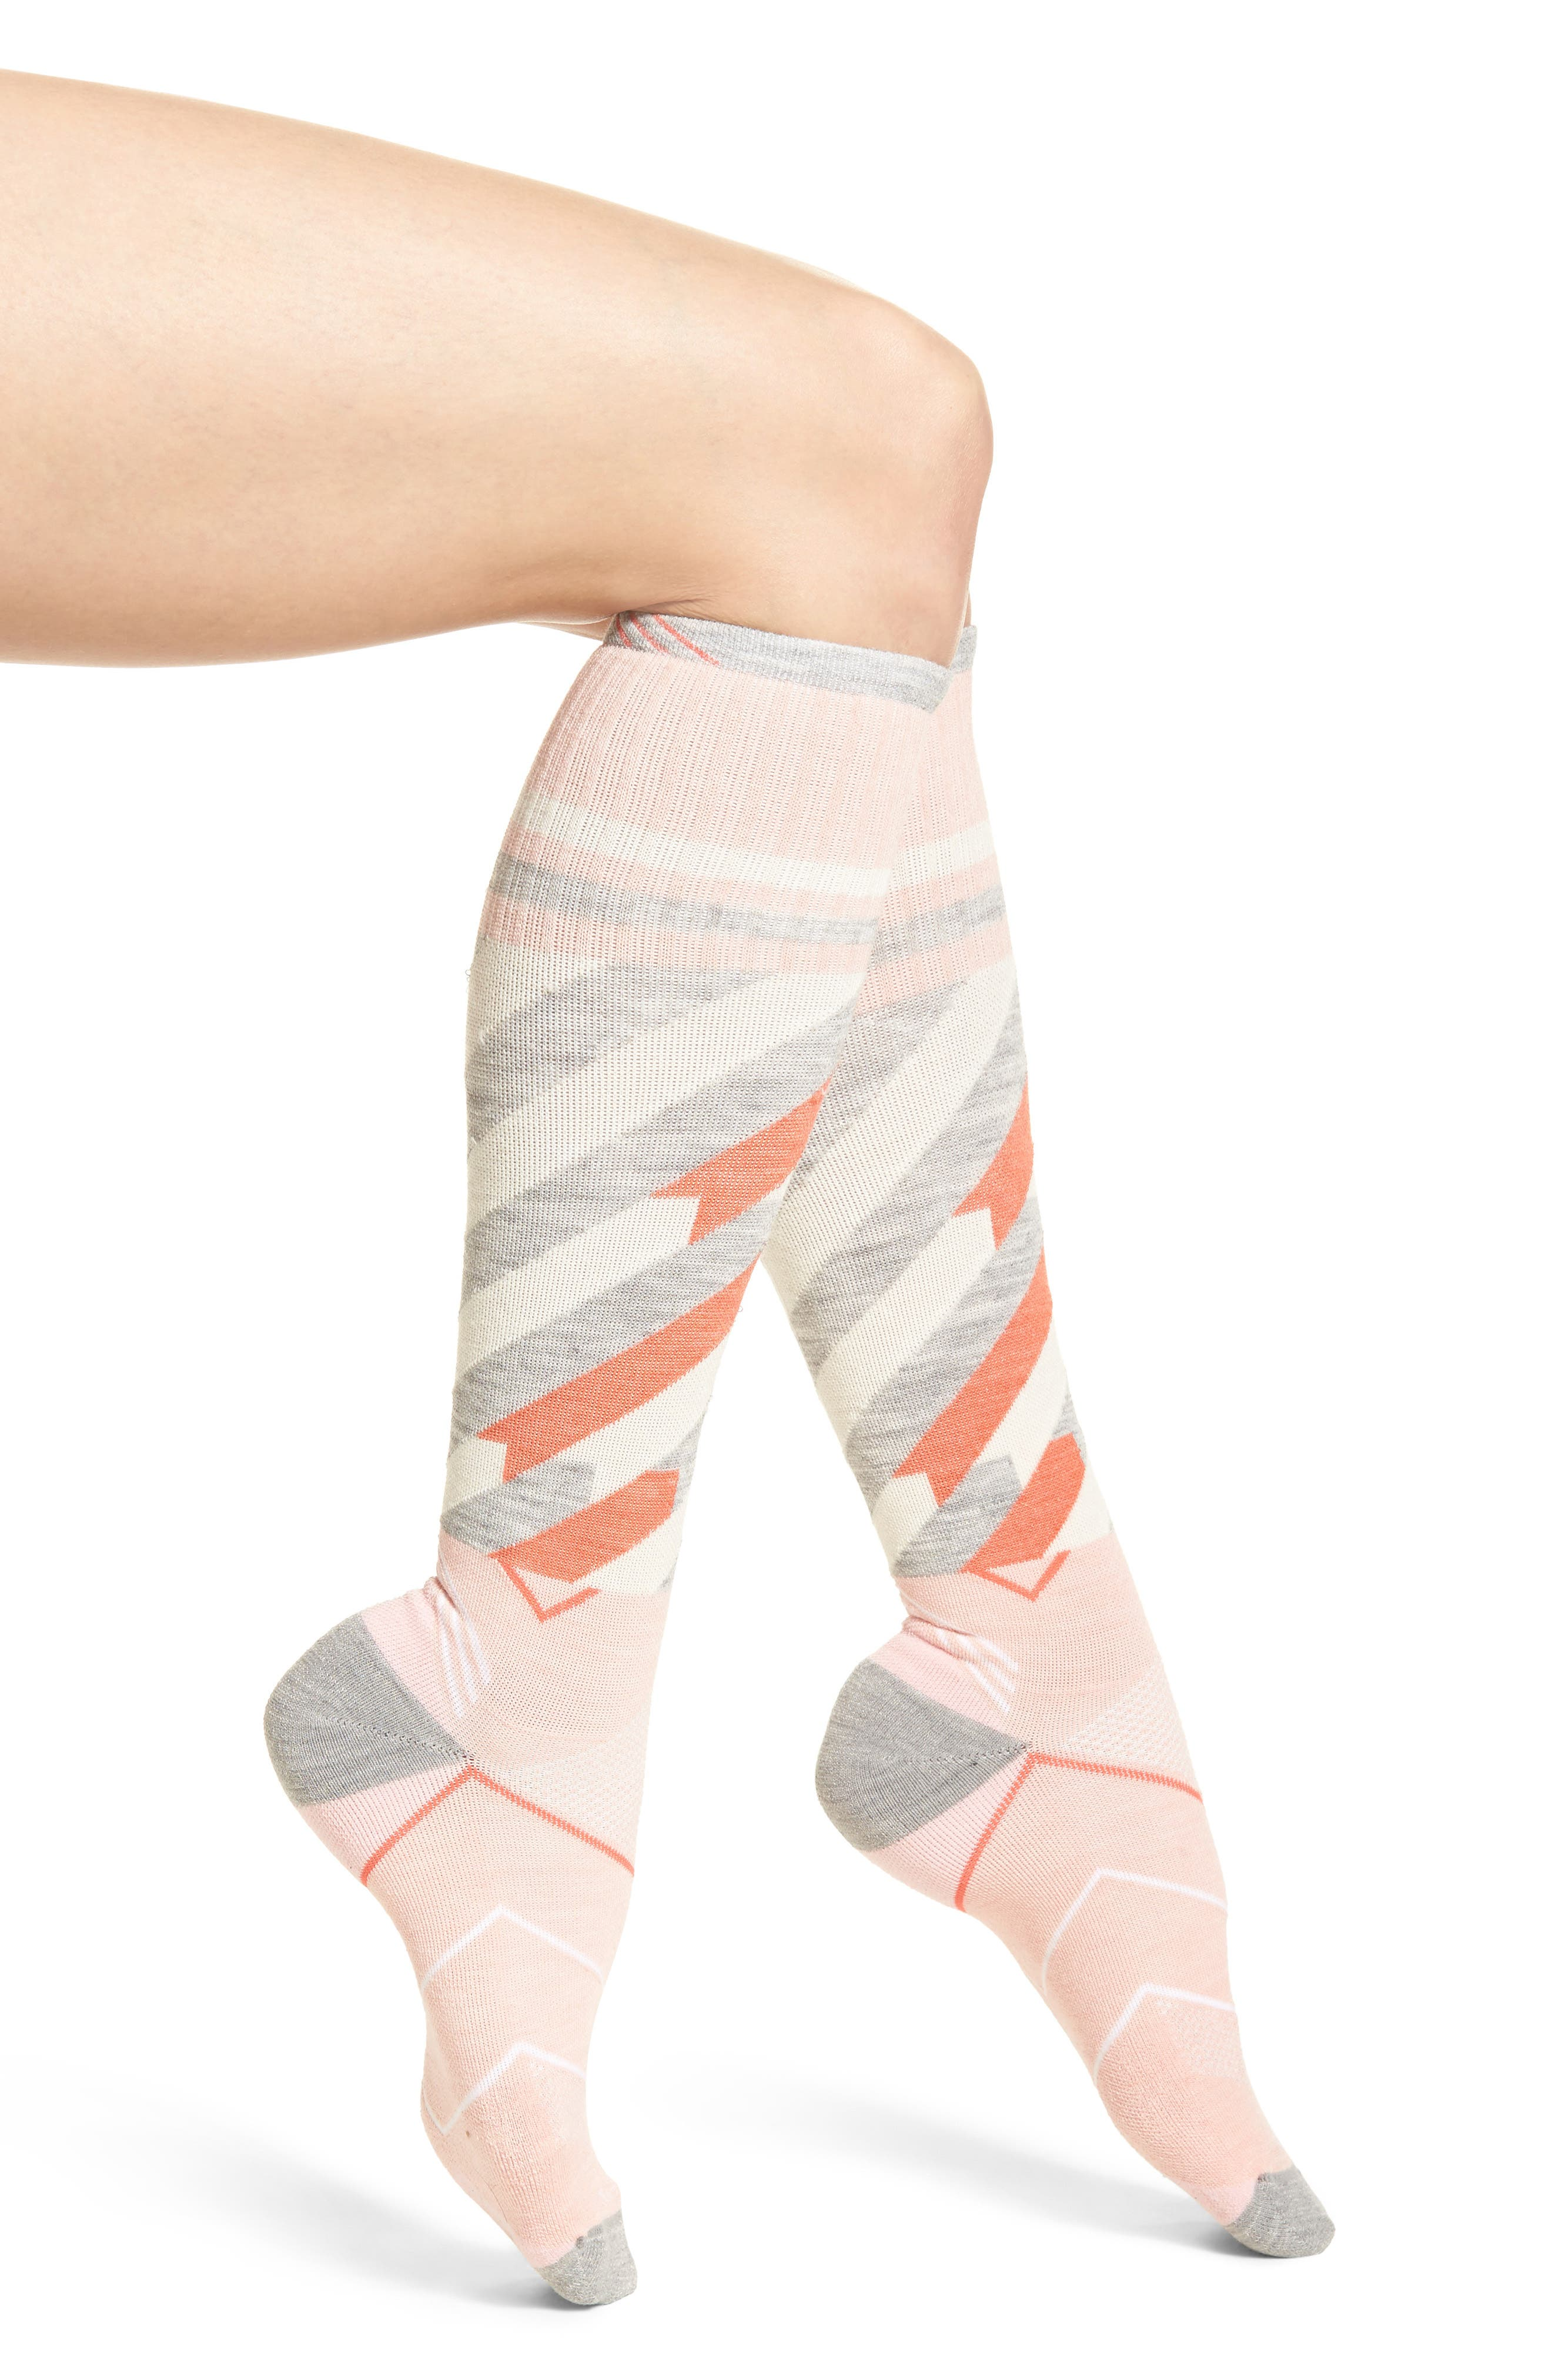 Cyclone Compression Knee Socks,                         Main,                         color, Rose